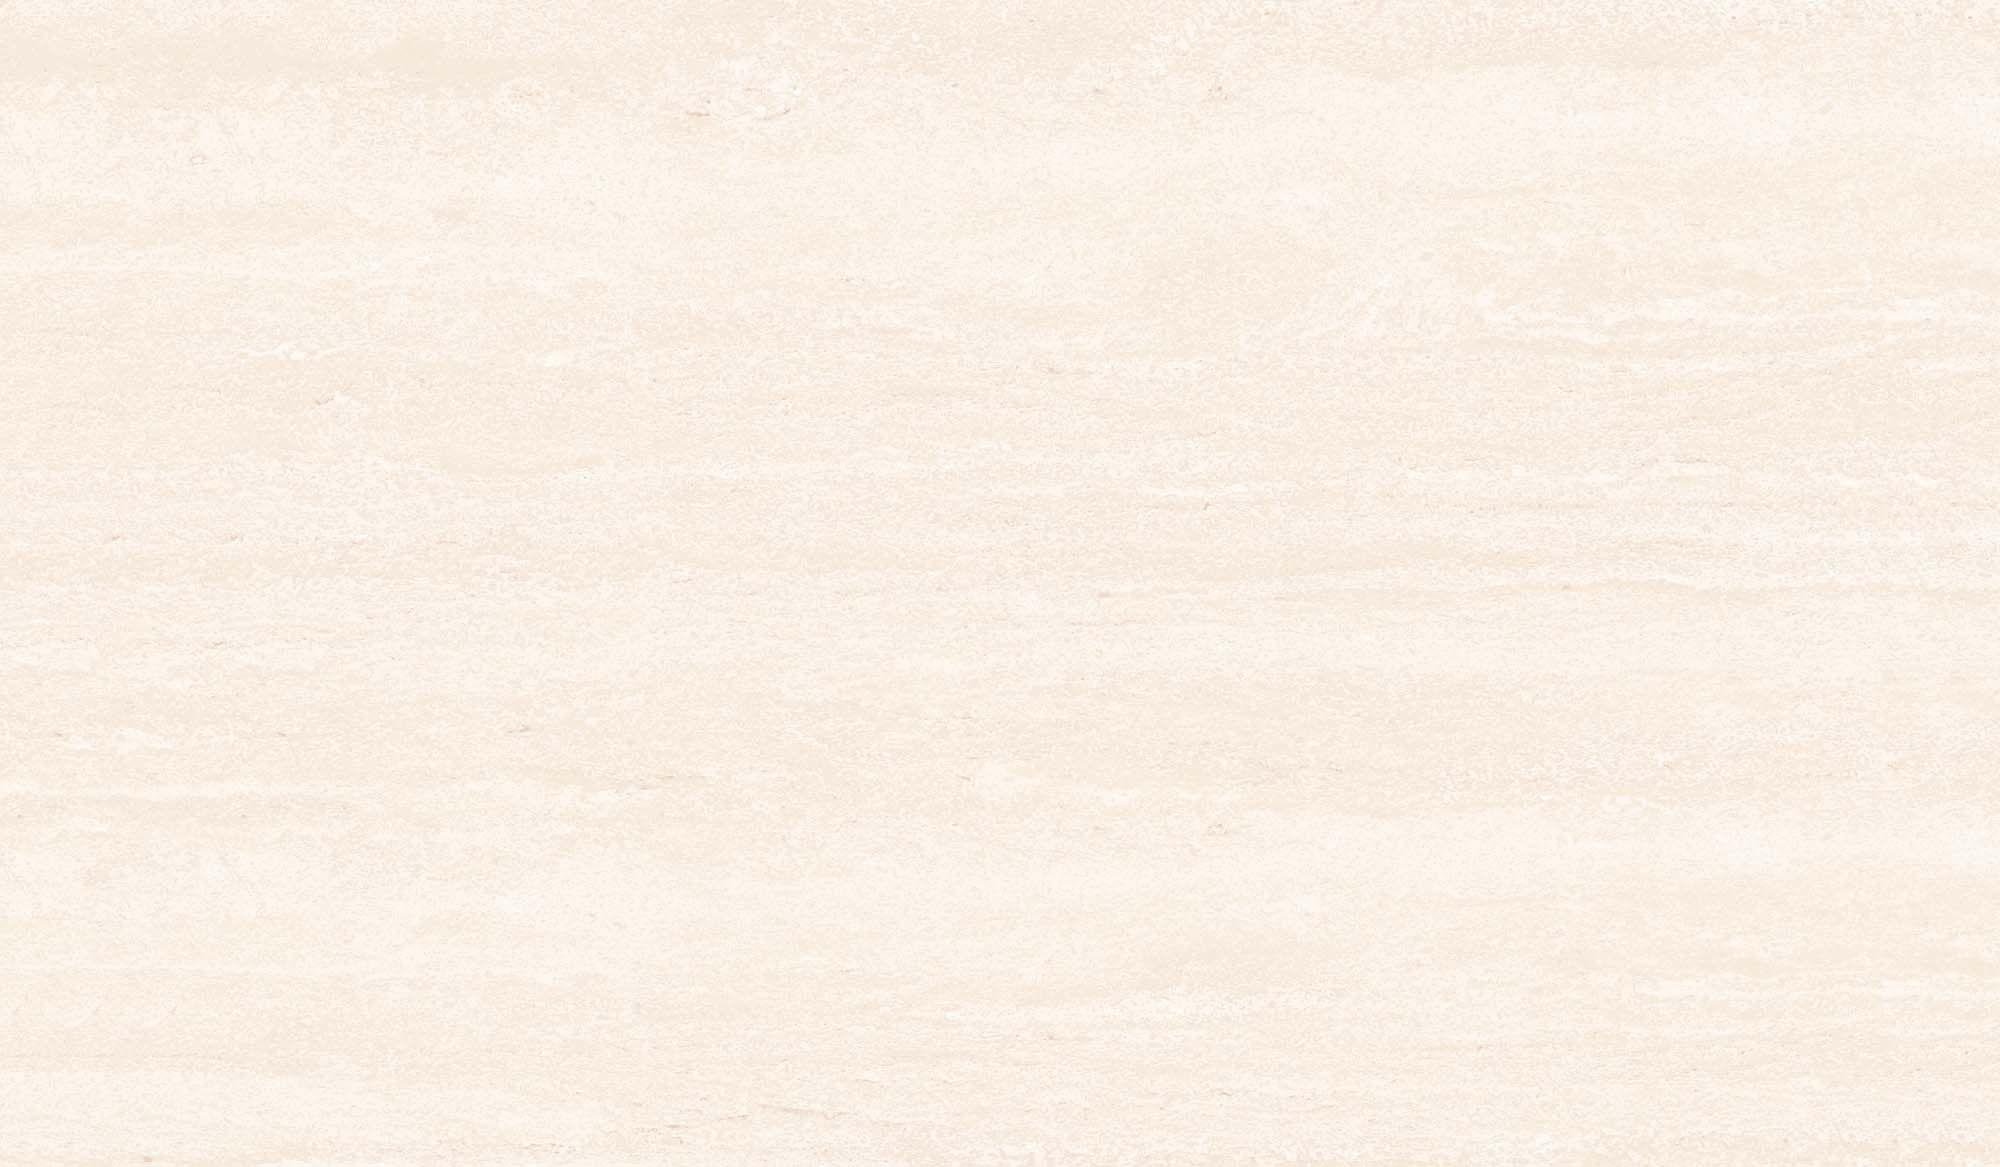 Revestimento Embramaco 33 x 57 Trevor Tex Beige Brilhante Ref  52913